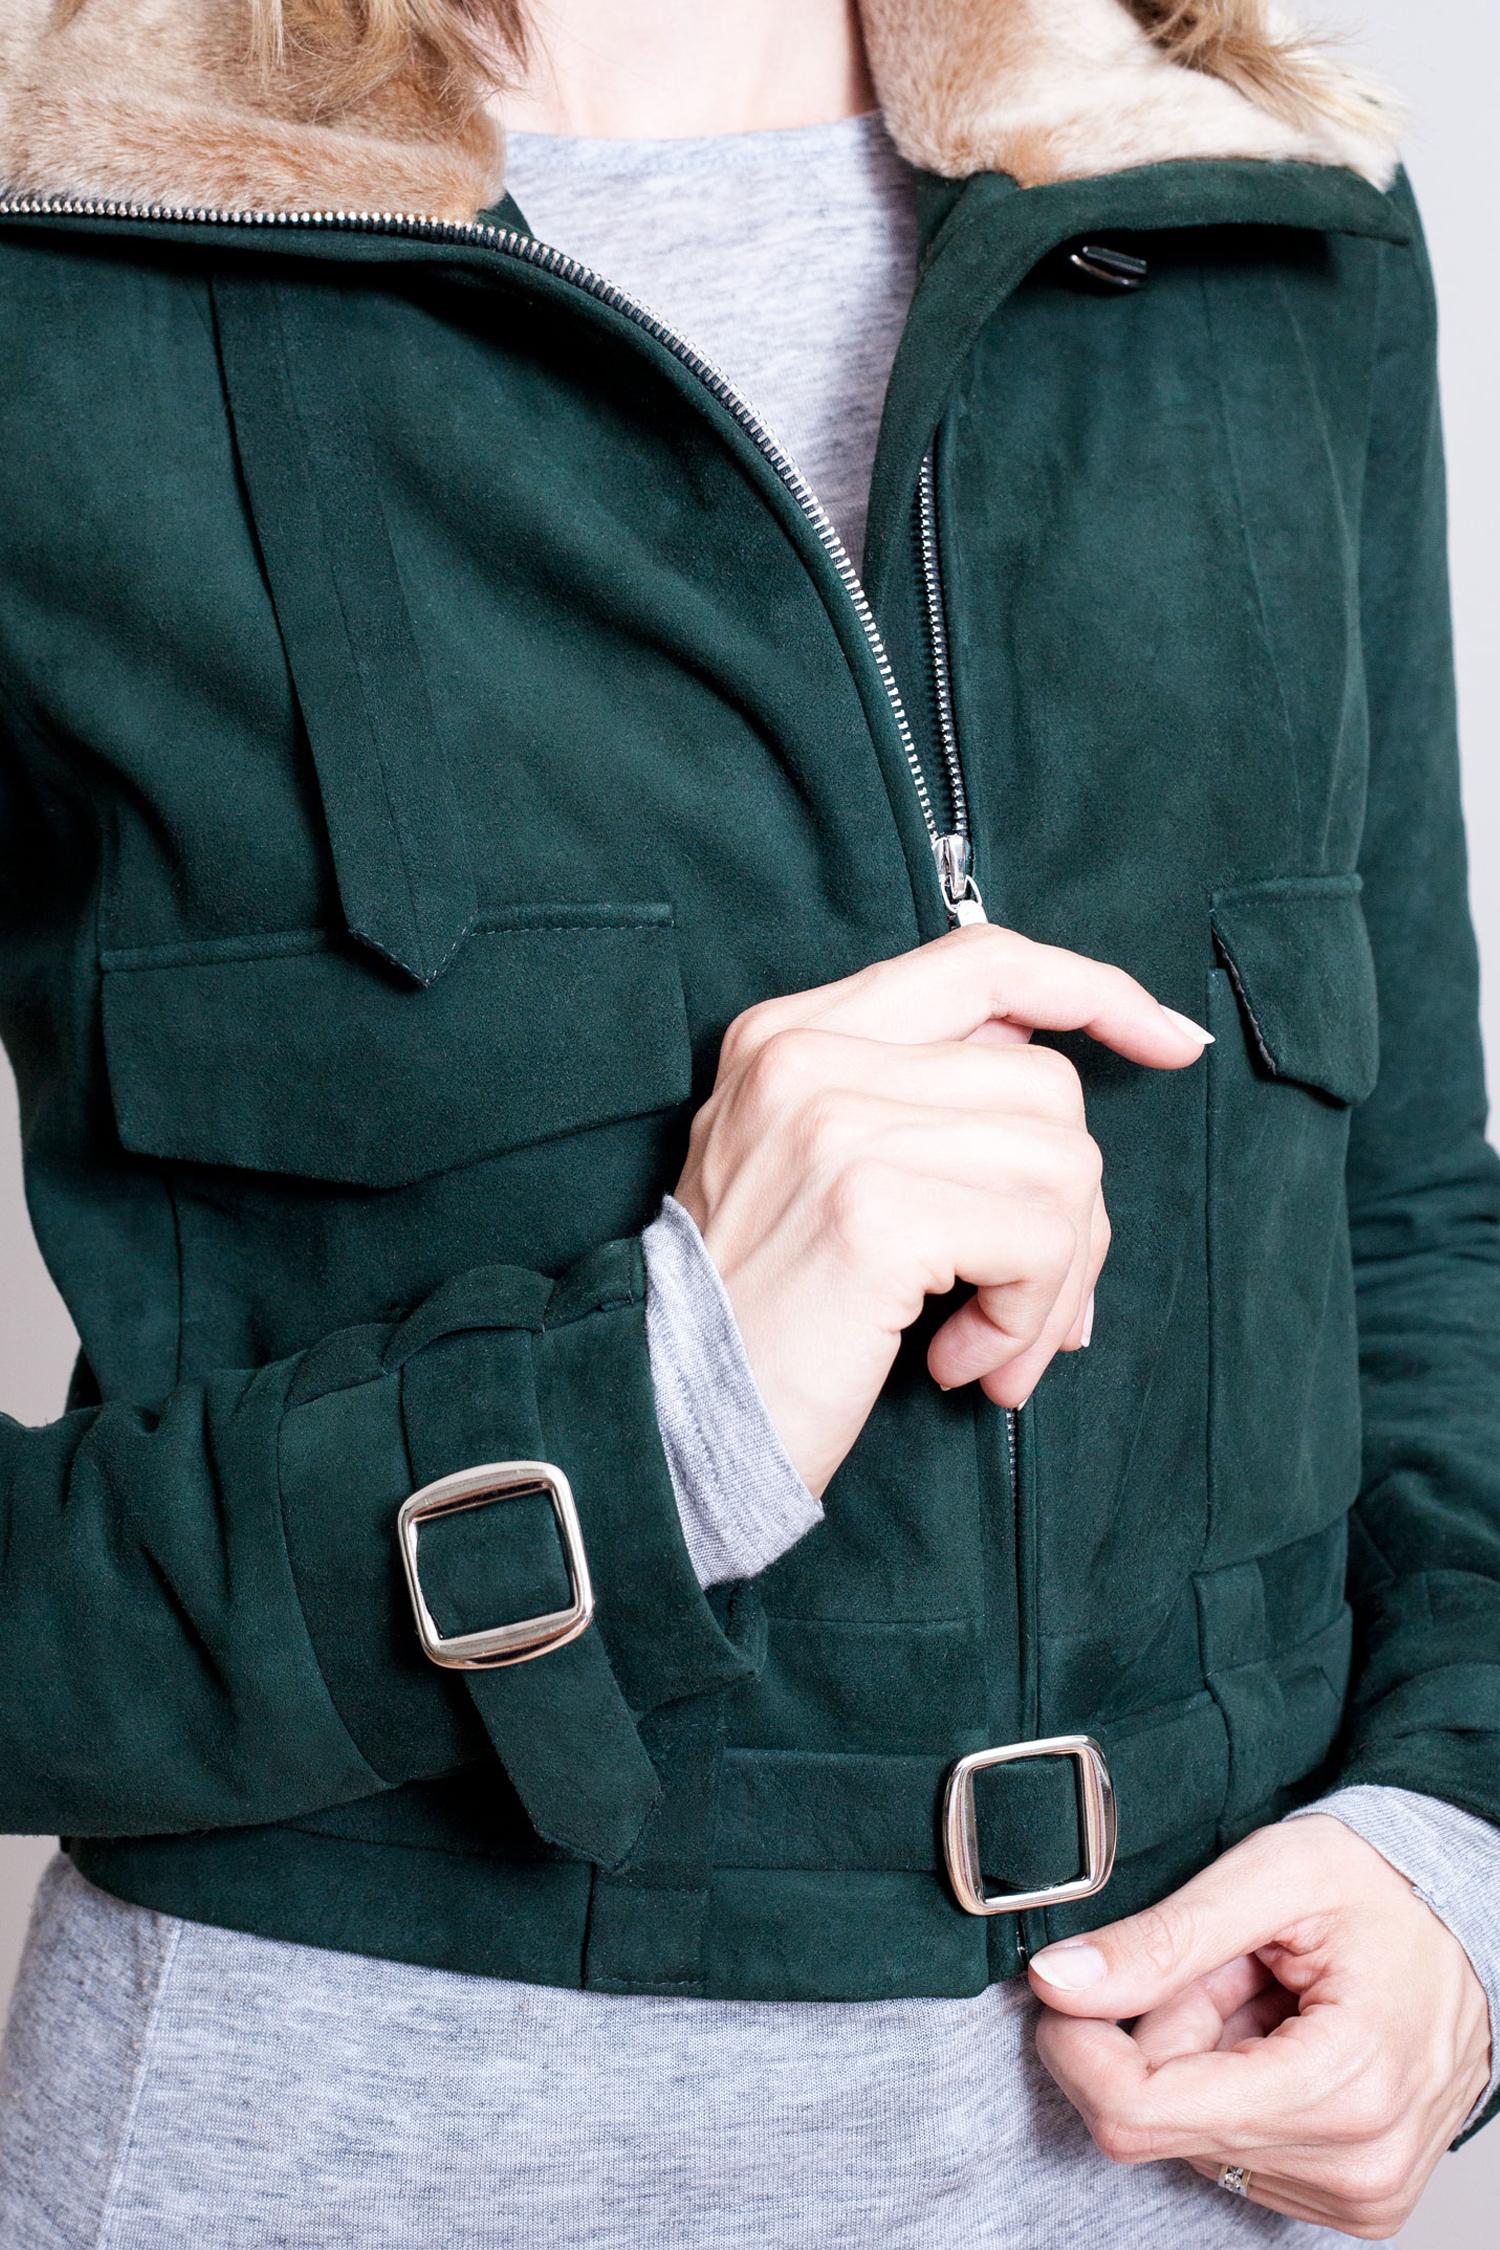 Zipper-Green-Shearling-Bomber.jpg